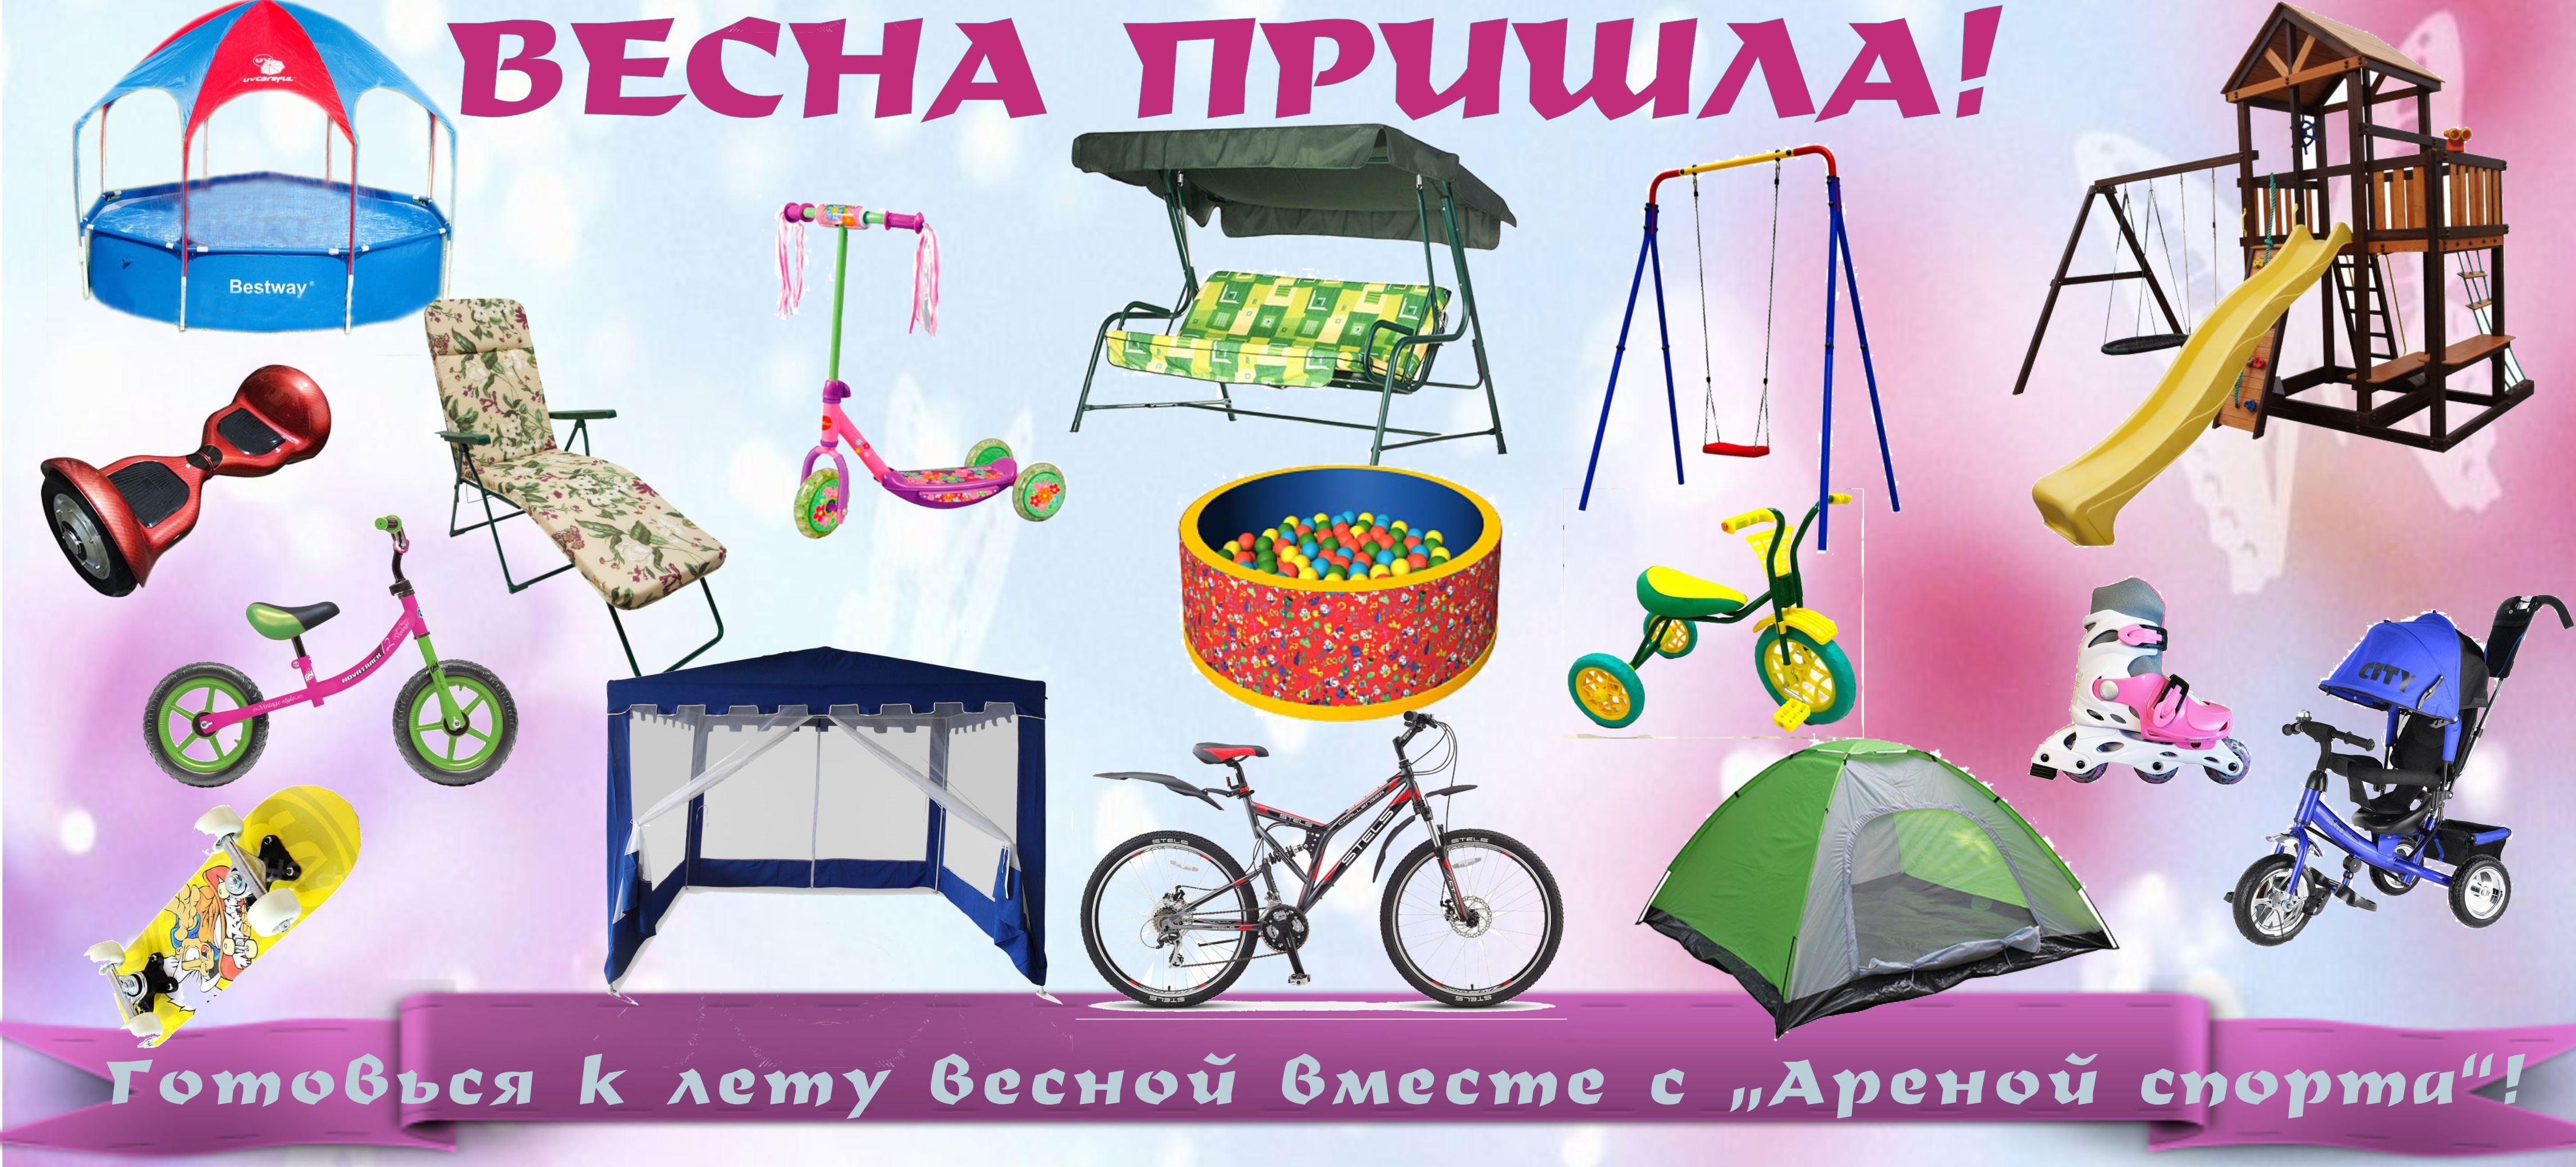 http://arena-sporta.by/catalog/letniy-assortiment